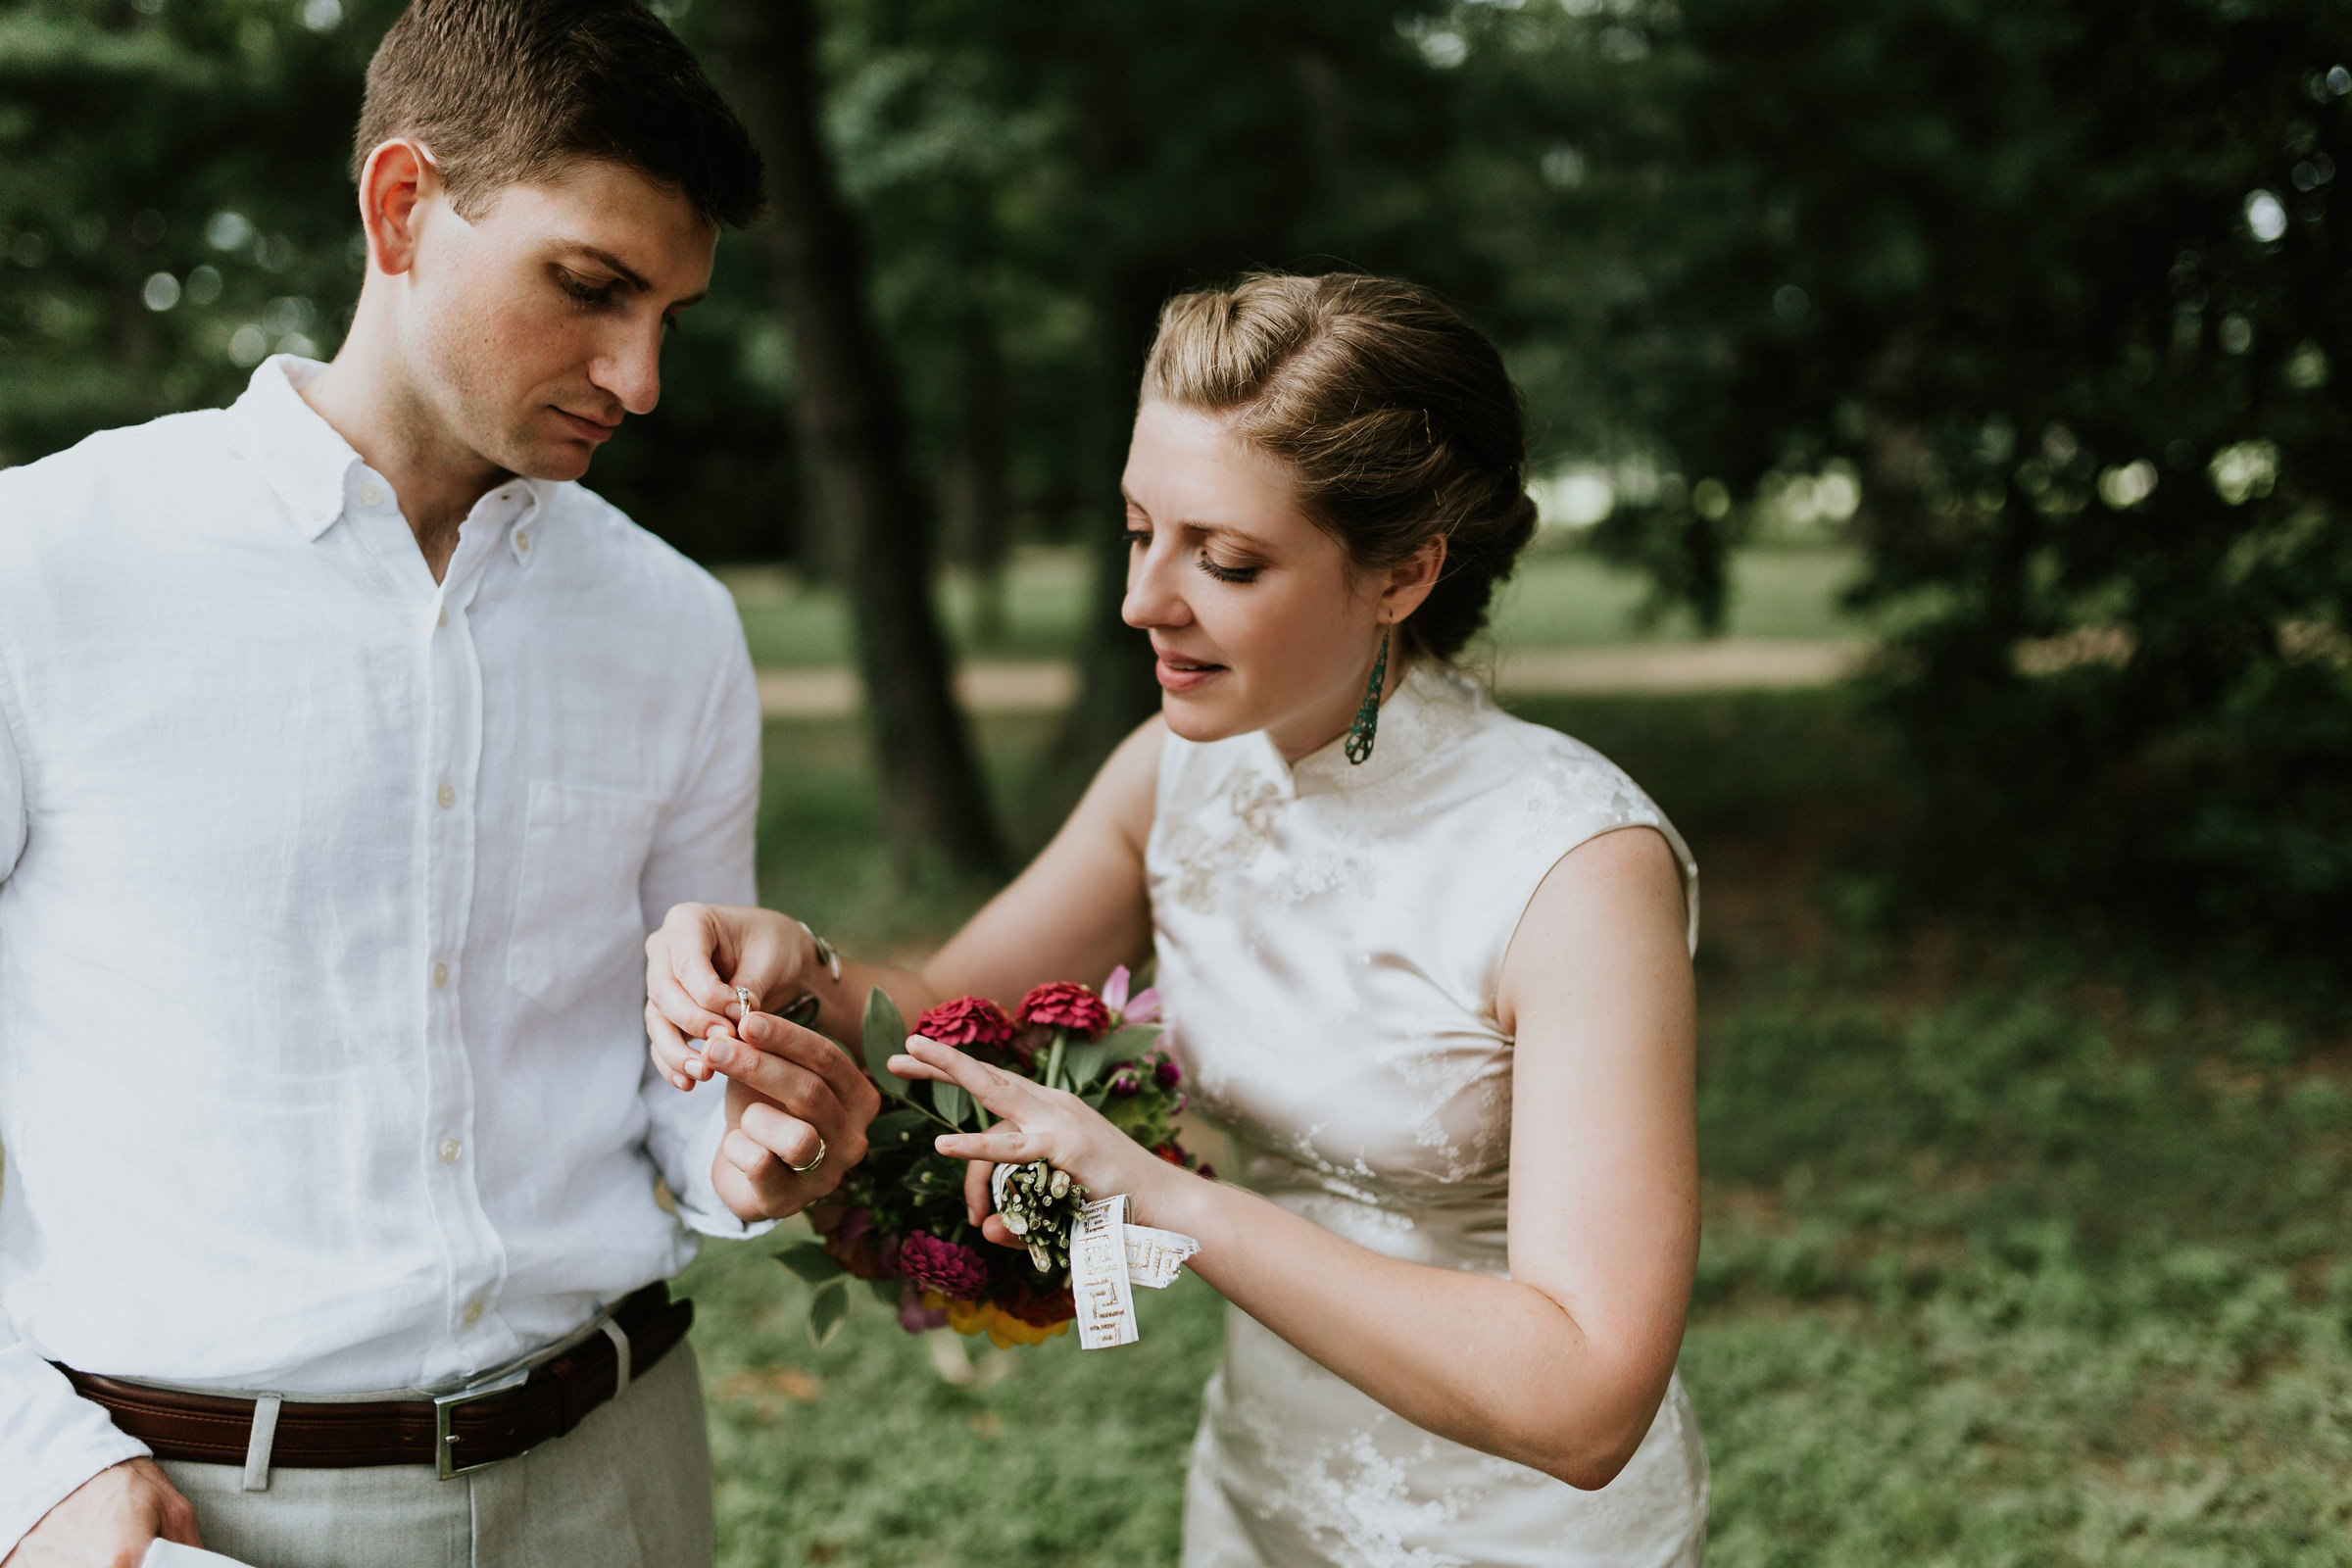 Kentucky_Candid_Wedding_Photographer_162.jpg